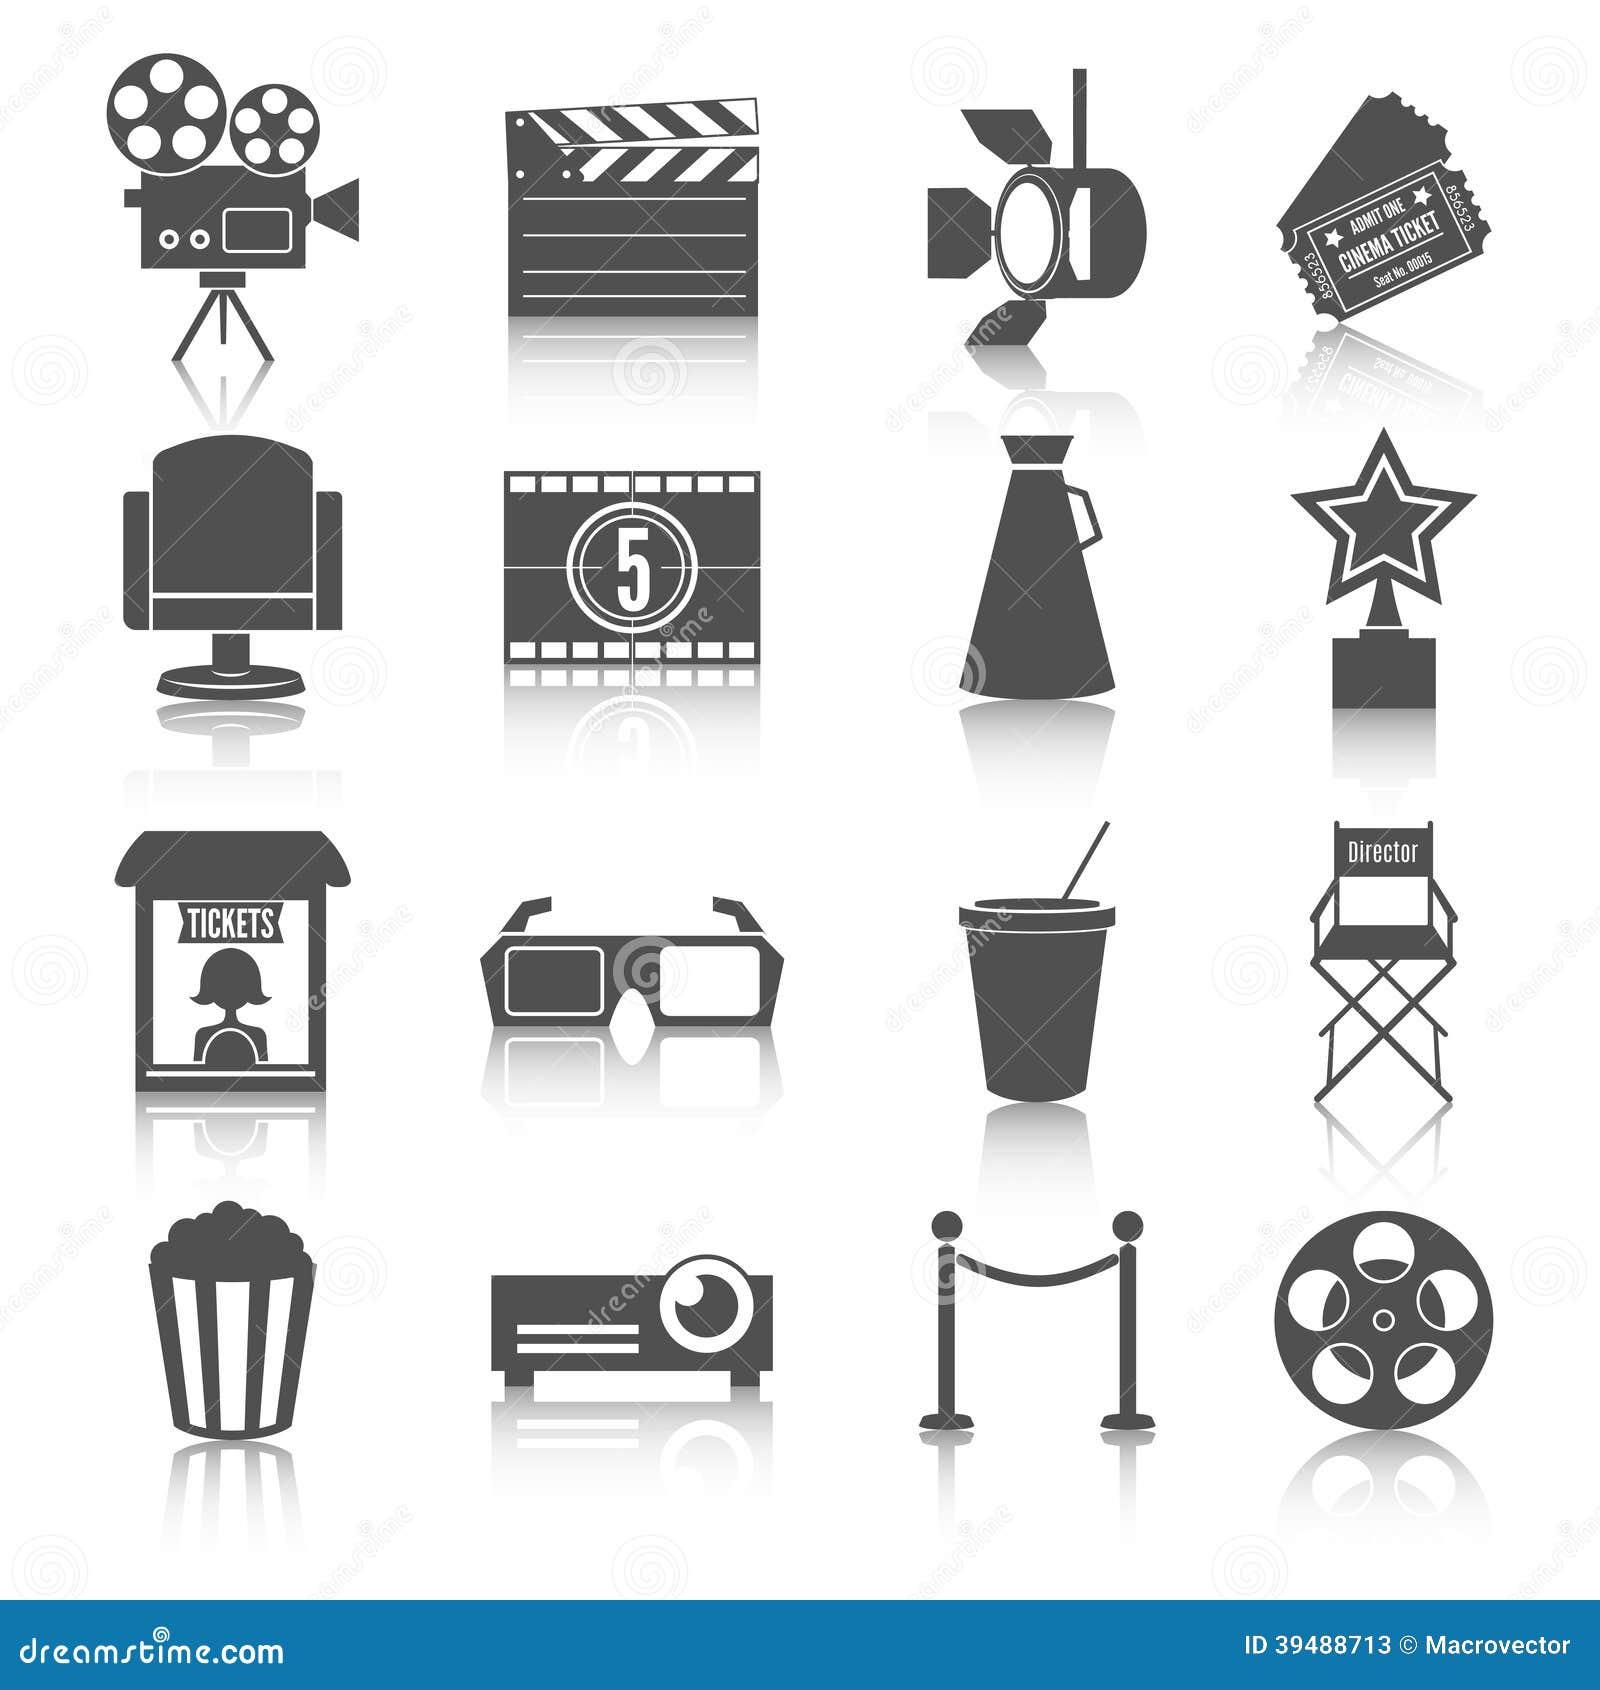 Cinema entertainment icons set of film popcorn movie tickets theatre